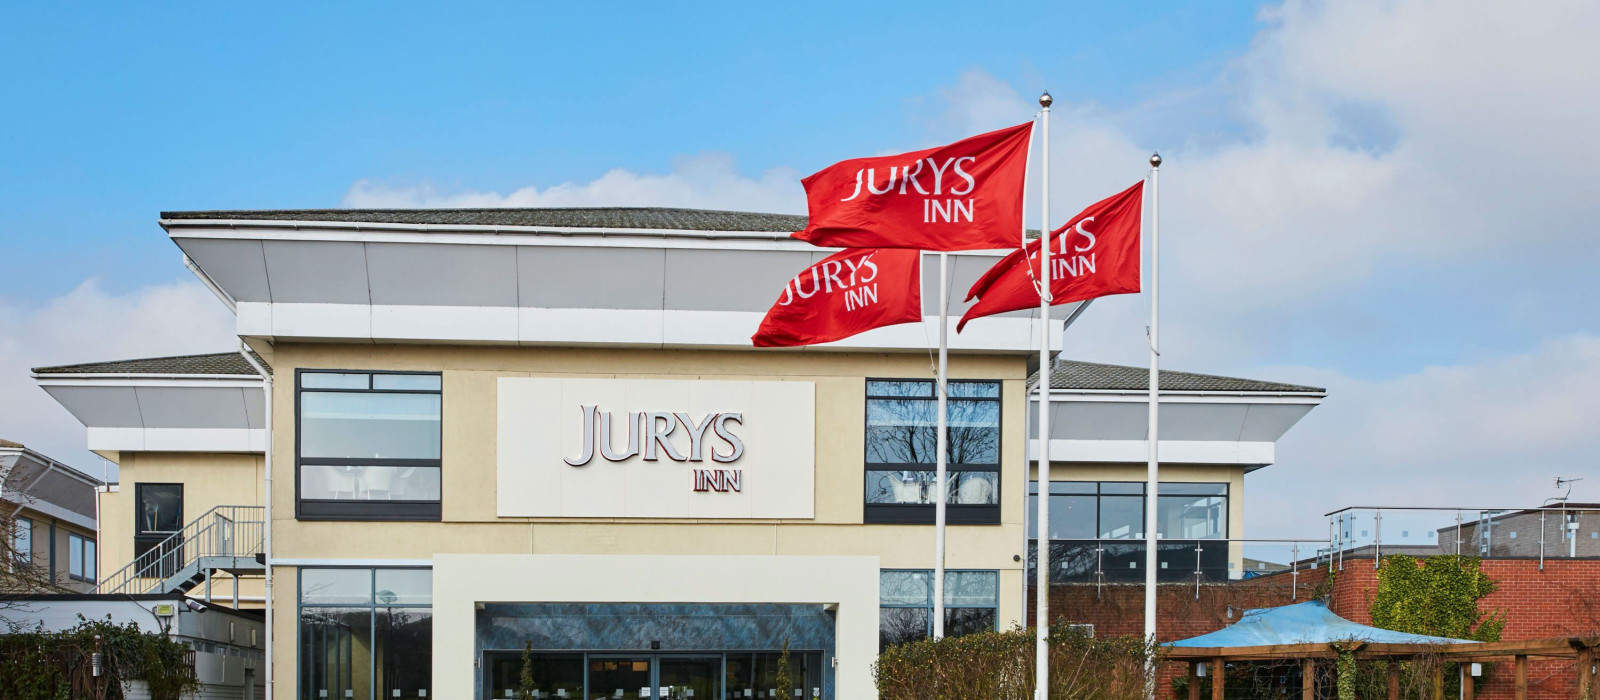 Hotel Jurys Inn Oxford UK & Ireland